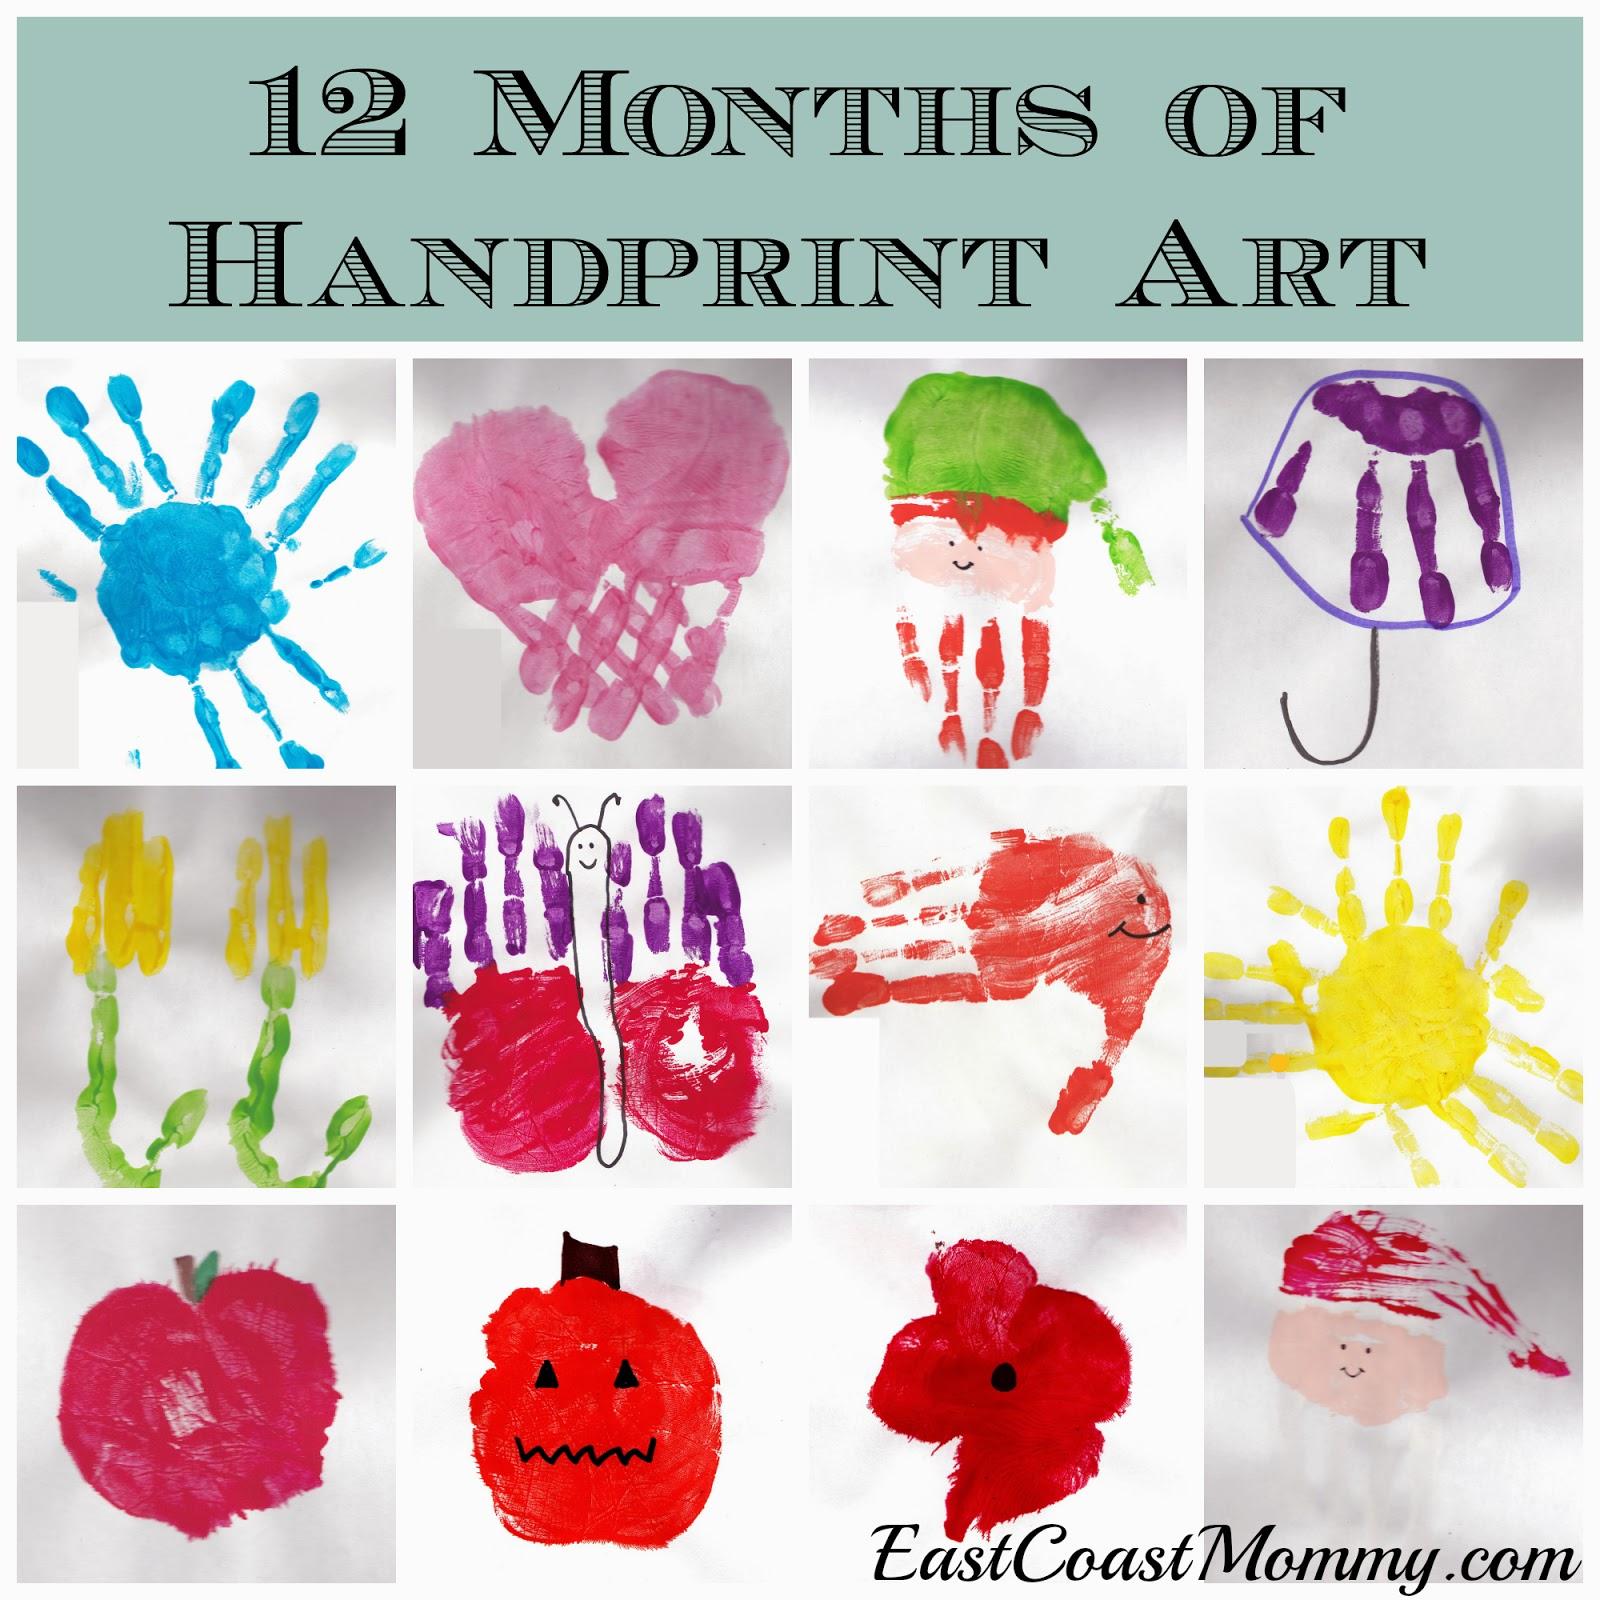 Who Created Calendar February Free Printable February 2017 Calendar Waterproof Paper East Coast Mommy 12 Months Of Handprint Art